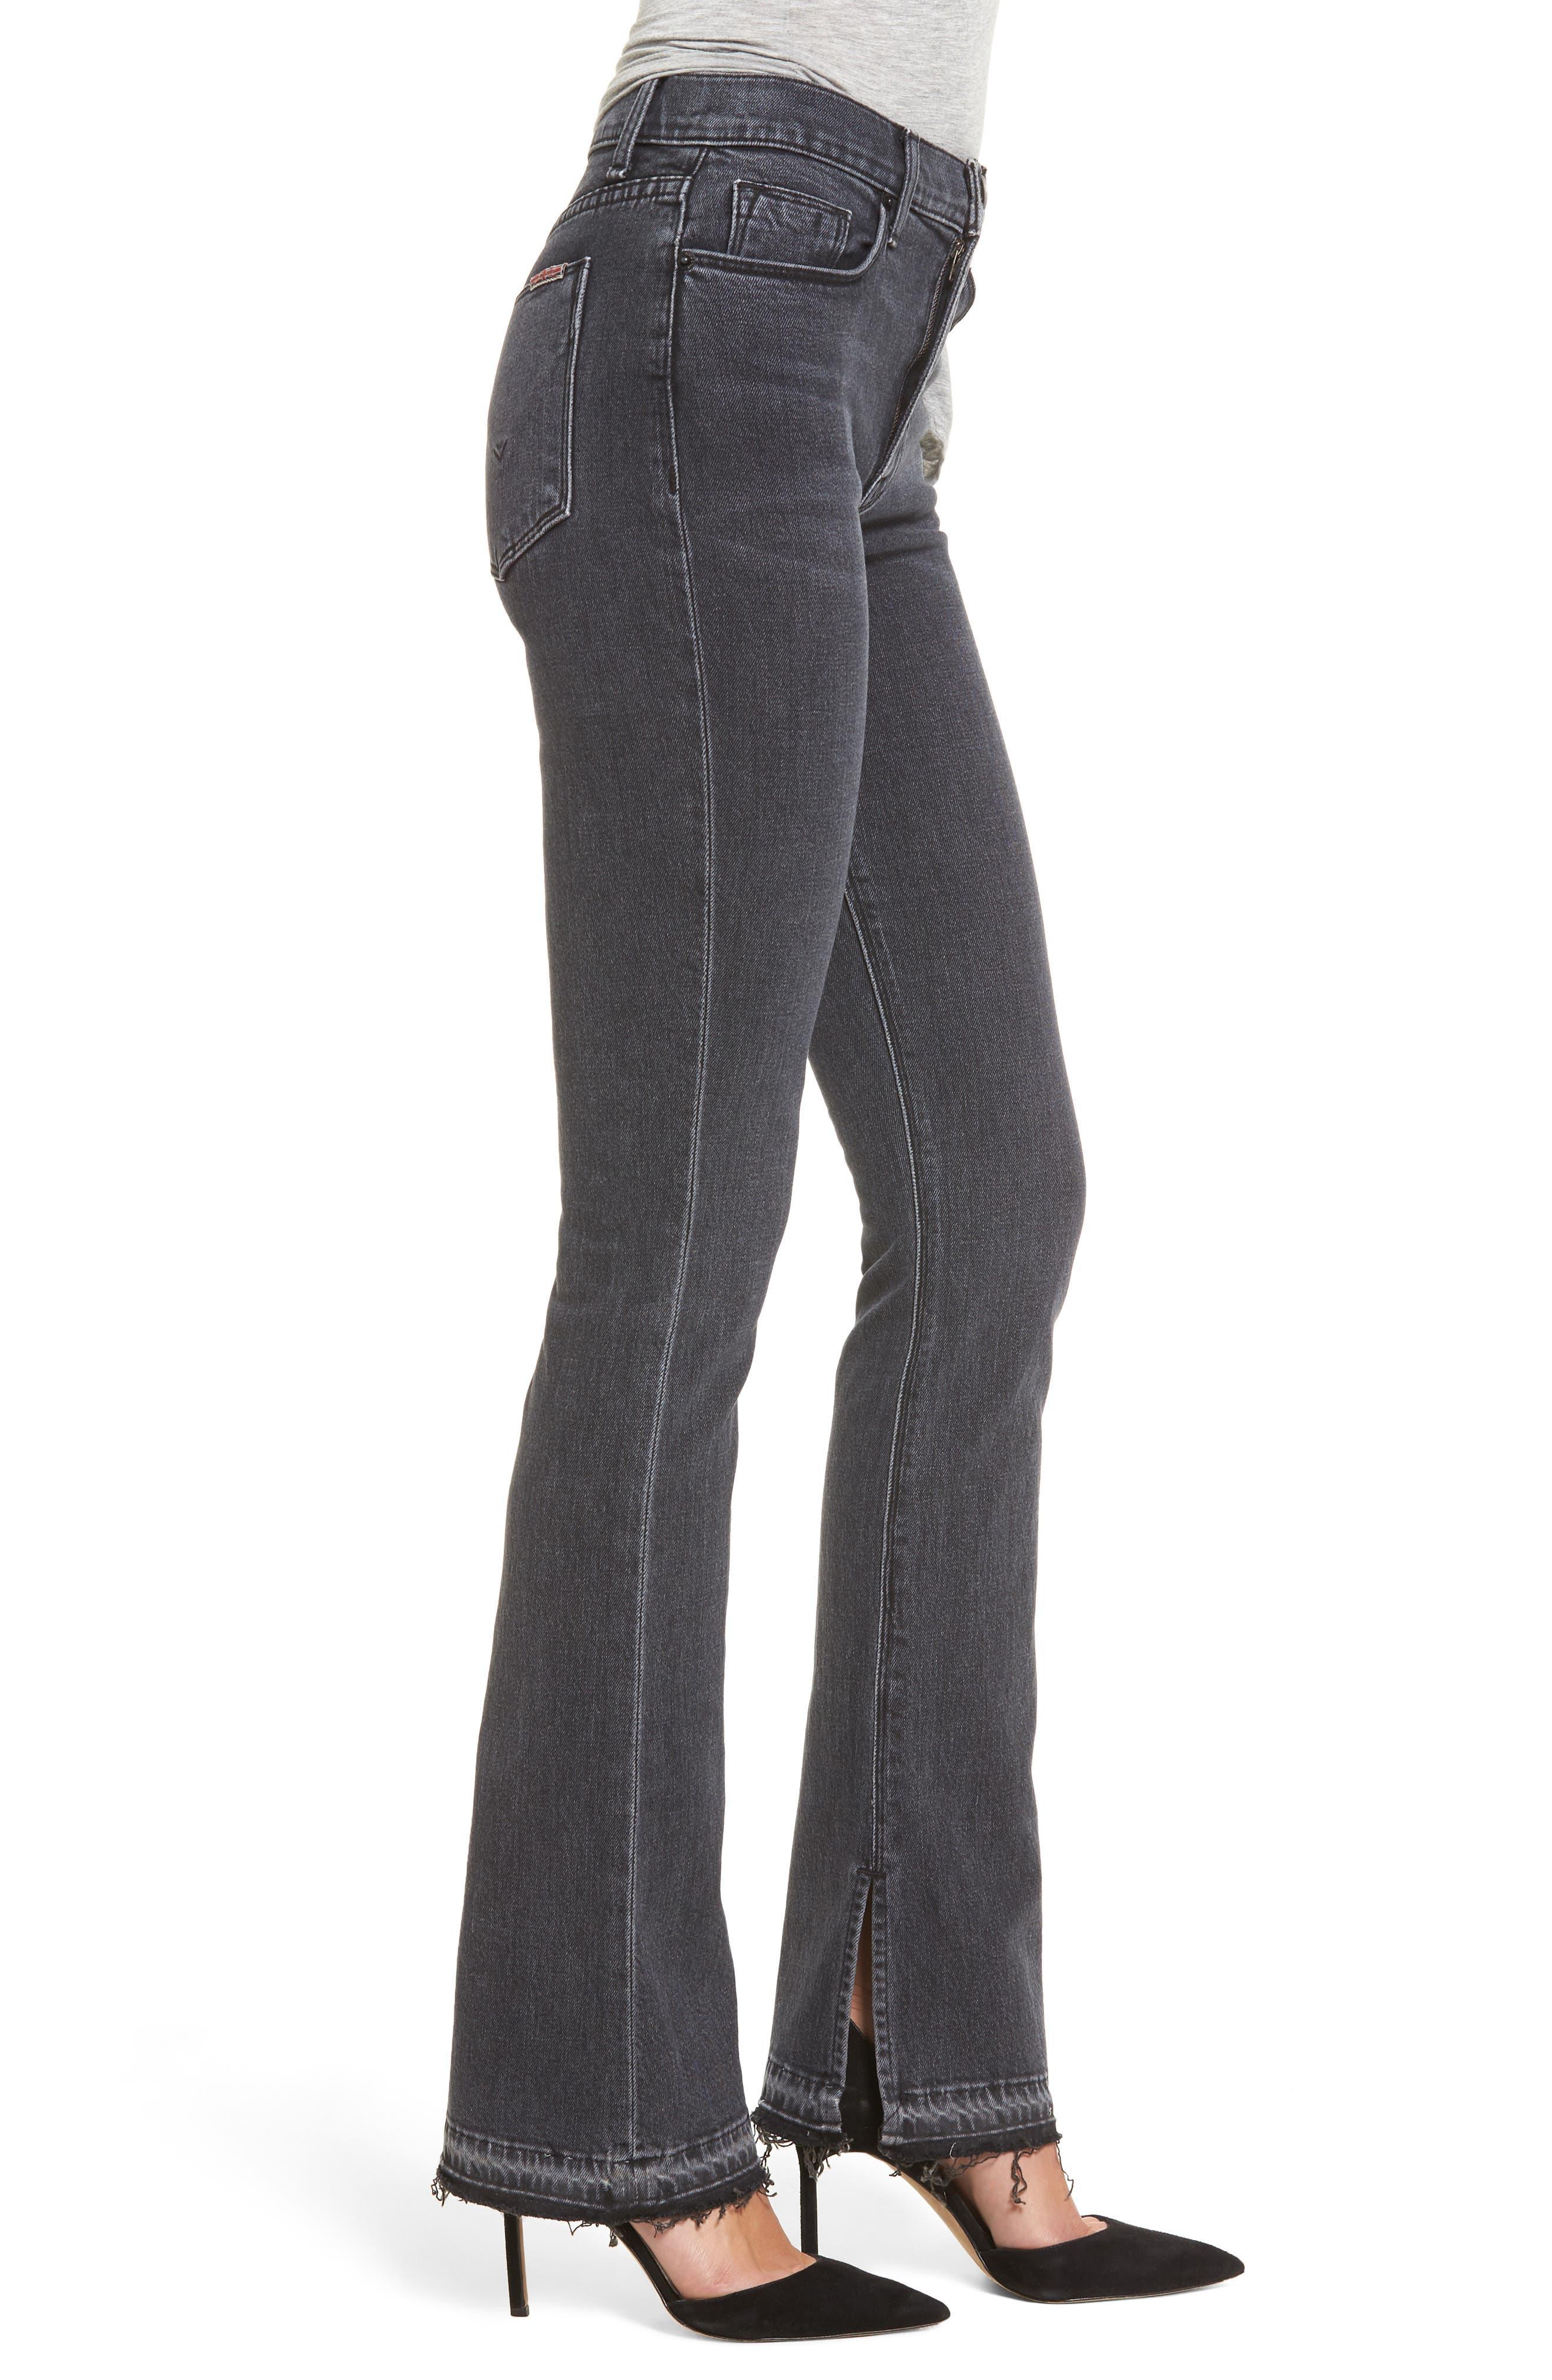 Heartbreaker High Waist Bootcut Jeans,                             Alternate thumbnail 3, color,                             001